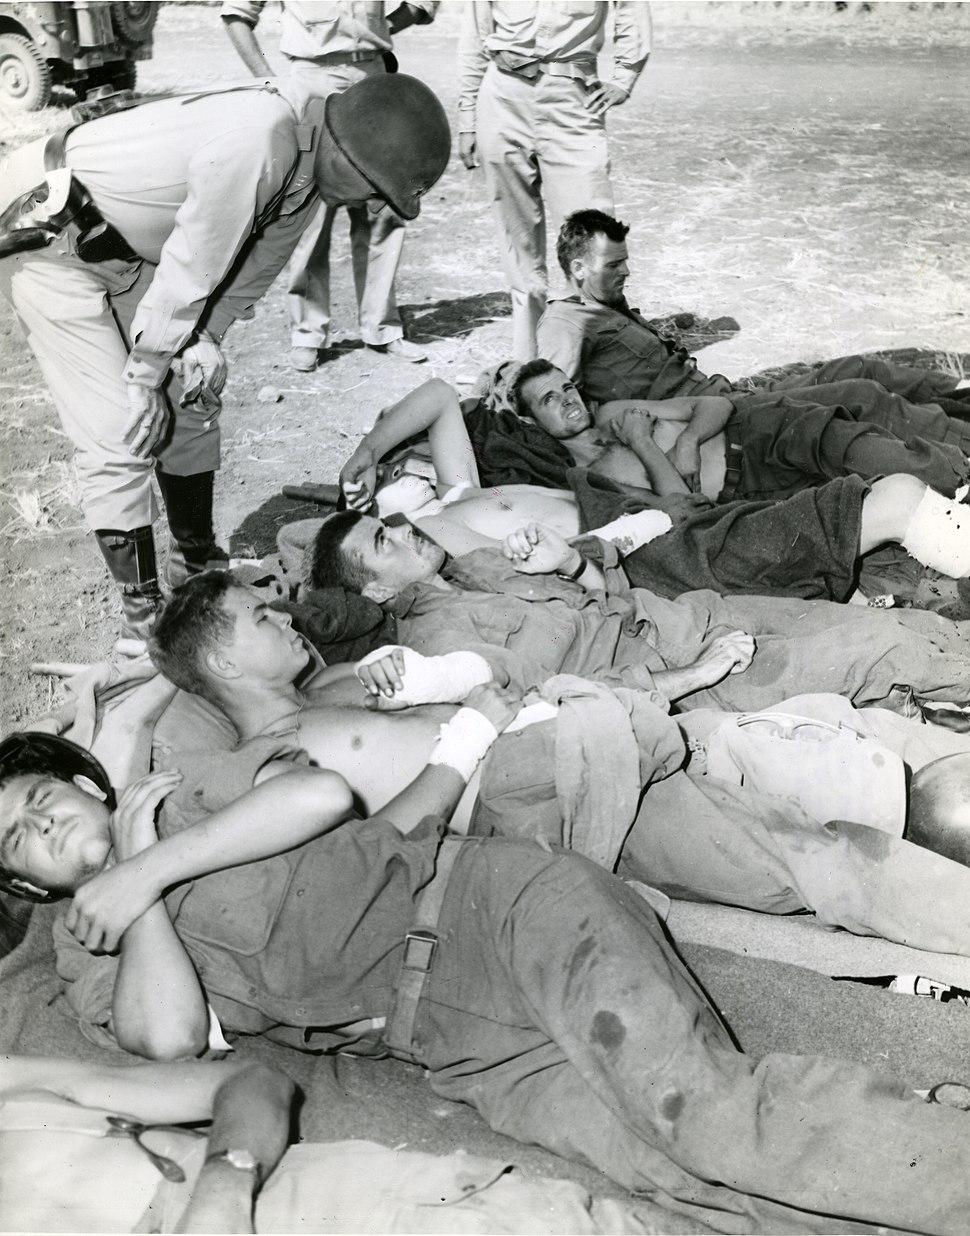 Wounded-on wayto-hospital-RG-208-AA-158-A-015